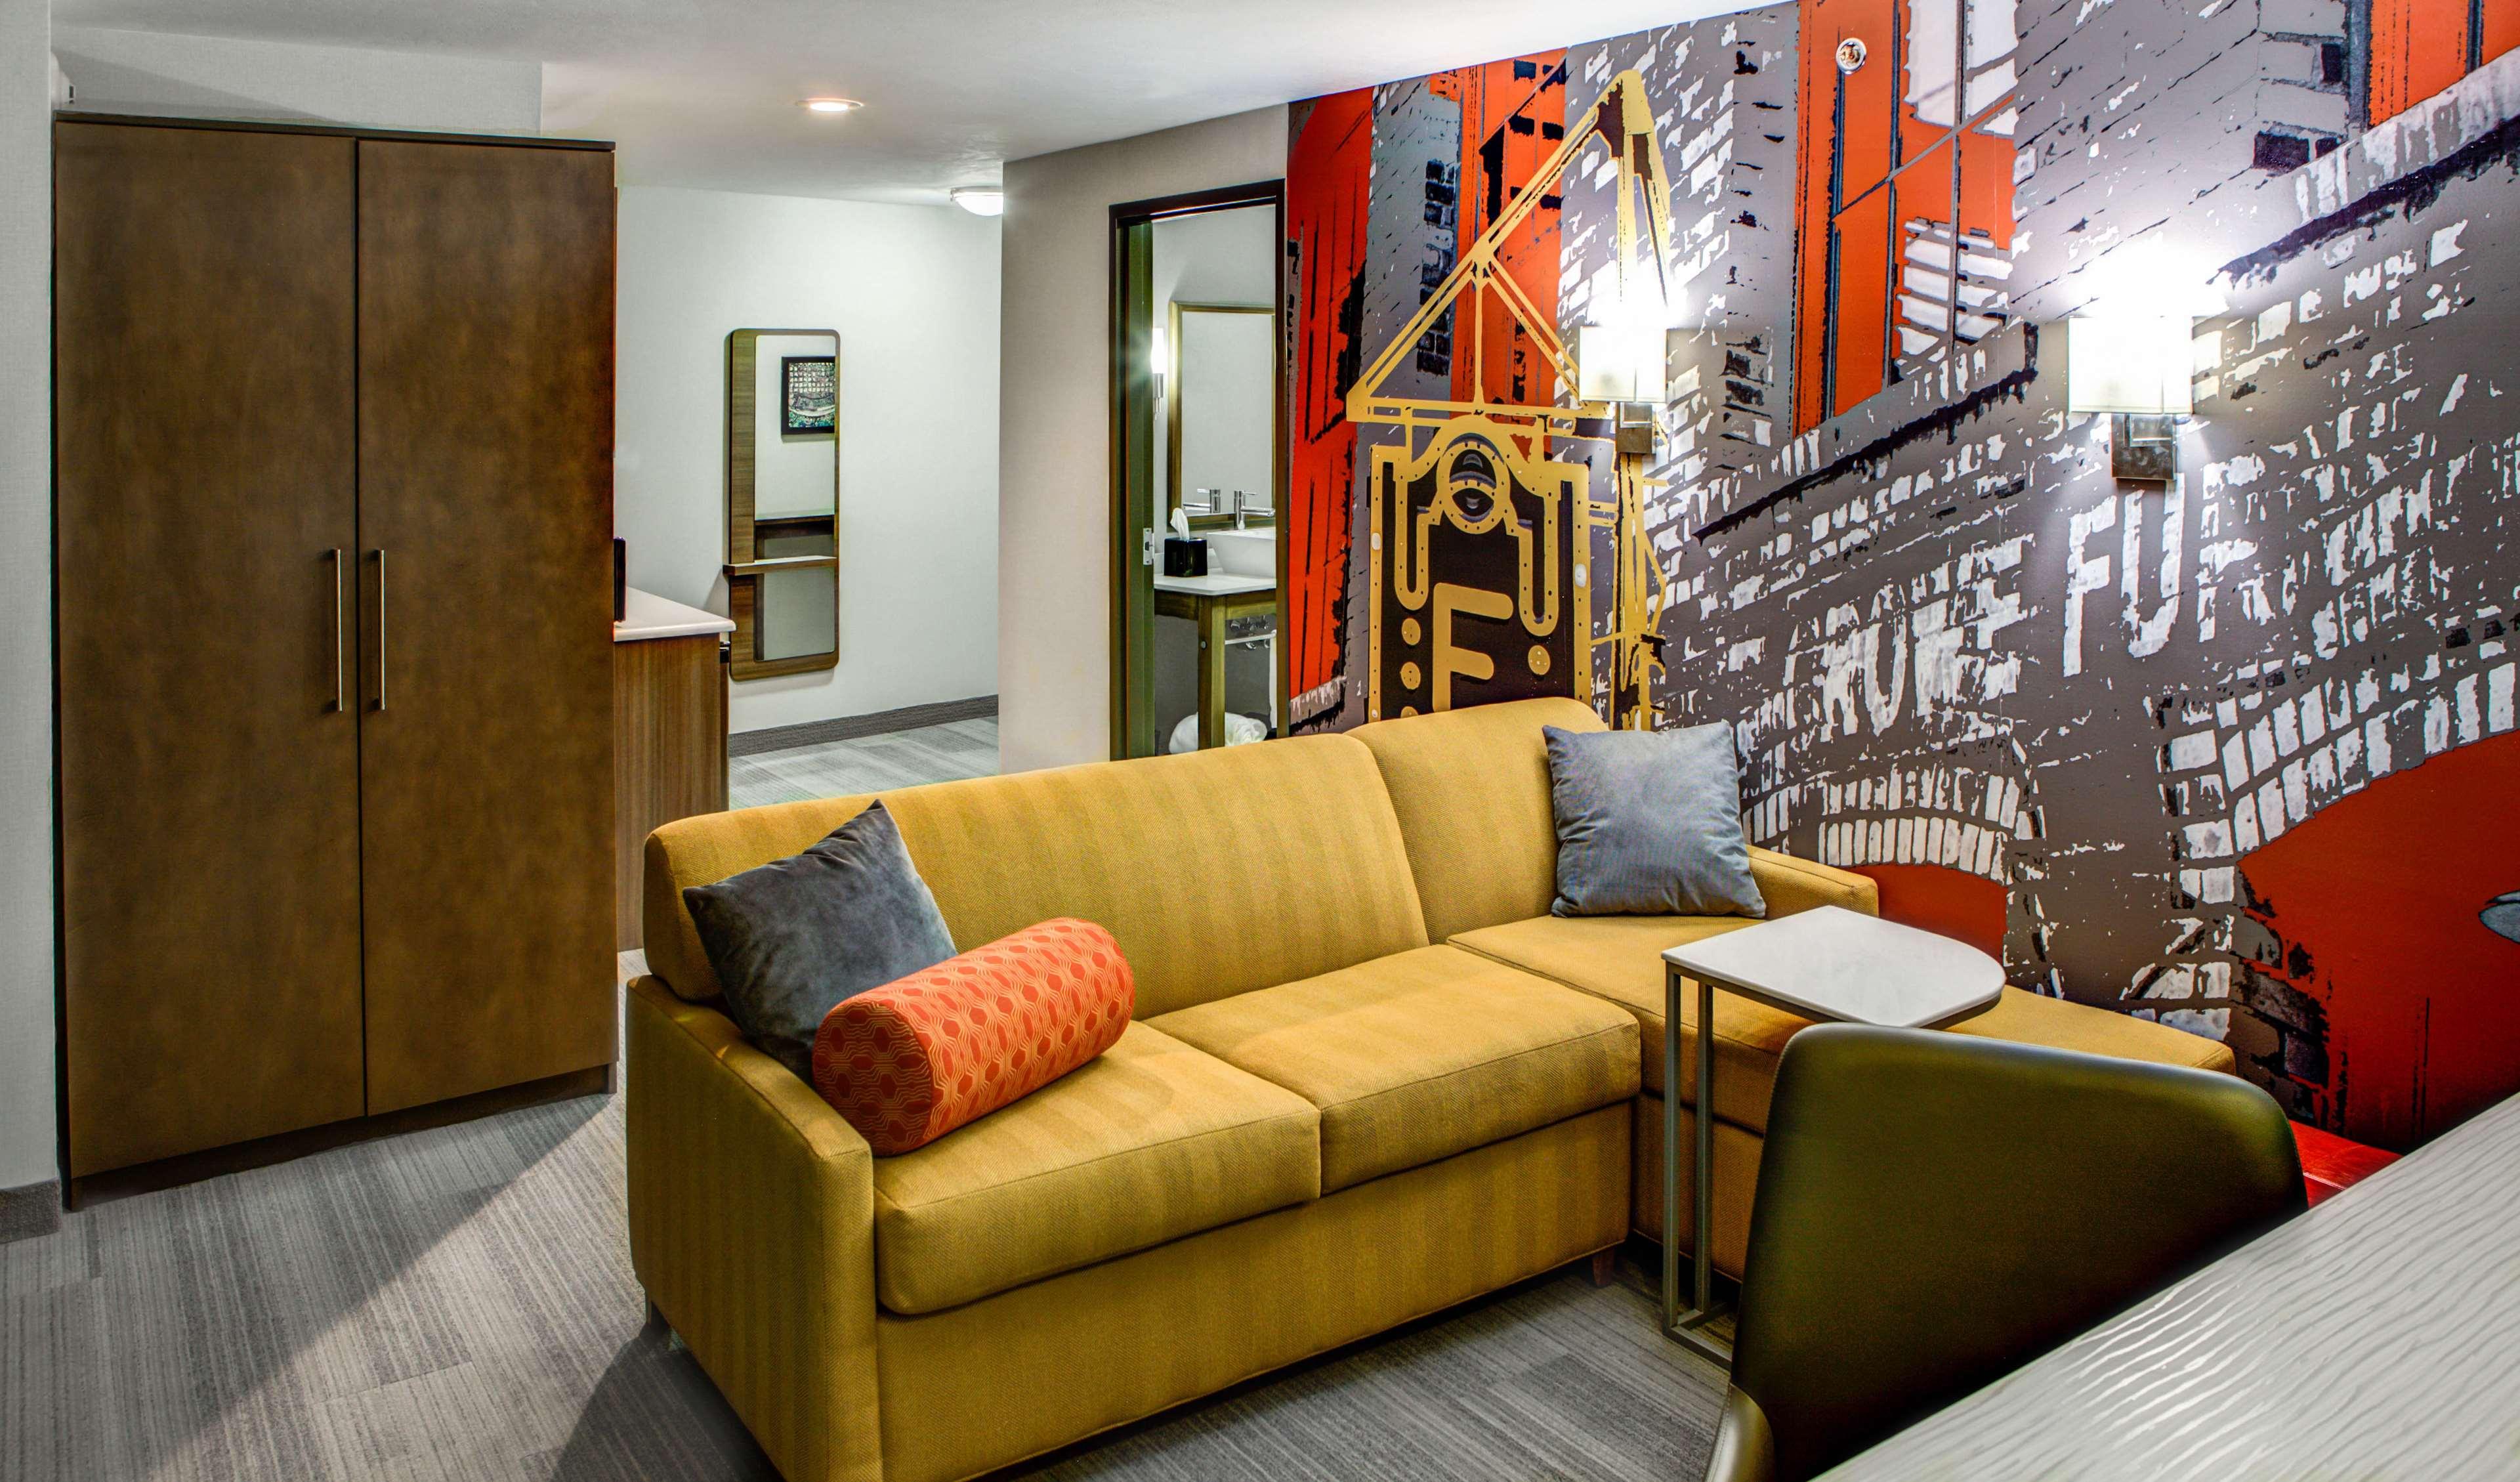 DoubleTree by Hilton West Fargo image 17